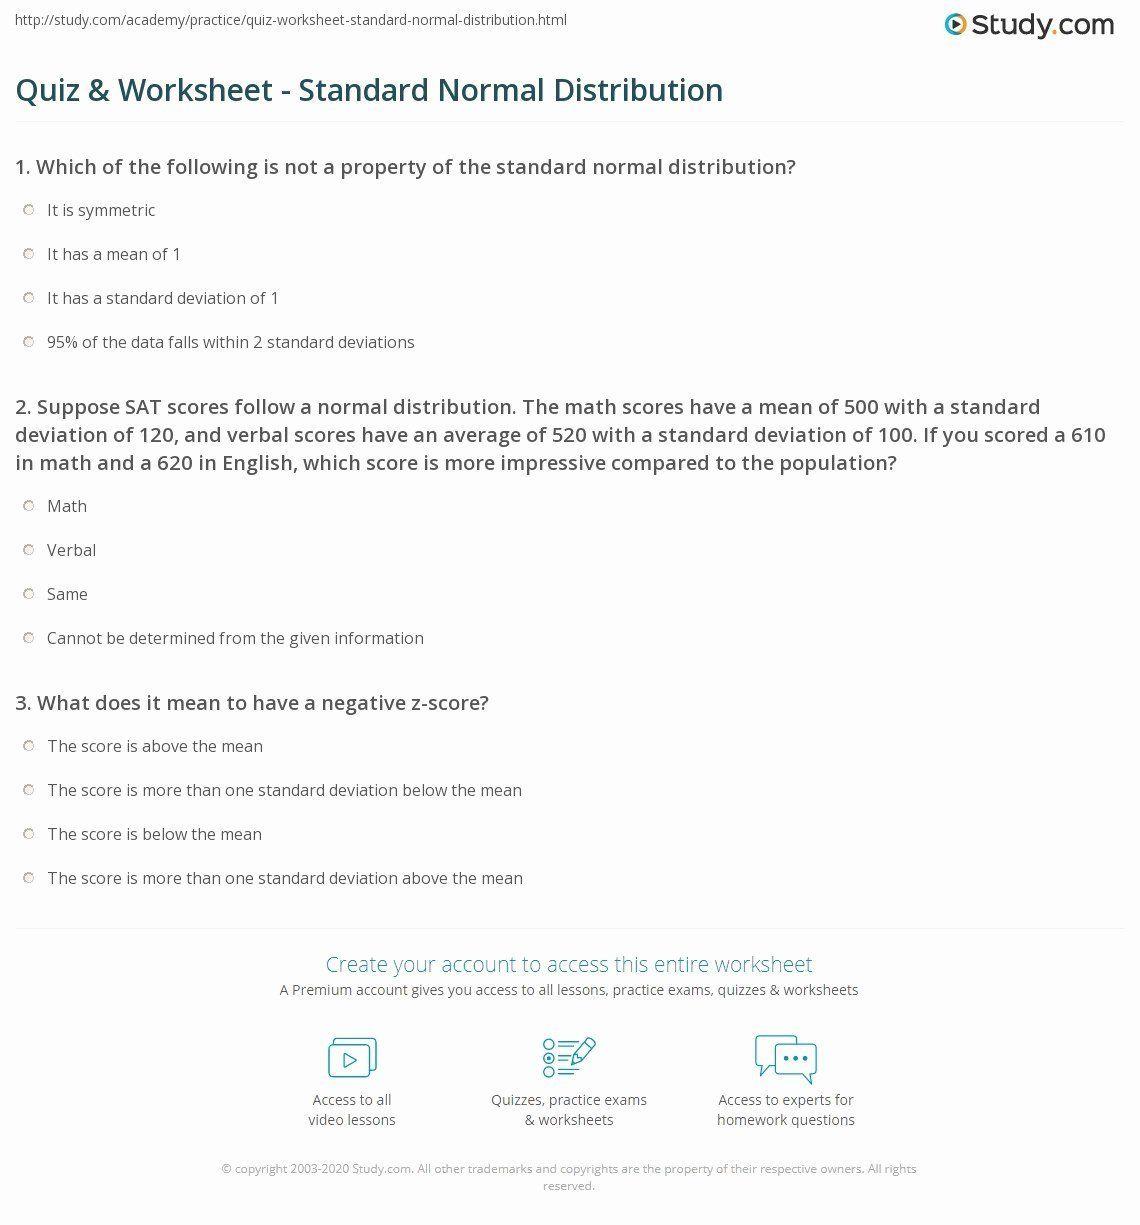 Z Score Practice Worksheet Beautiful Quiz Worksheet Standard Normal Distribution In 2020 Practices Worksheets Worksheets Normal Distribution